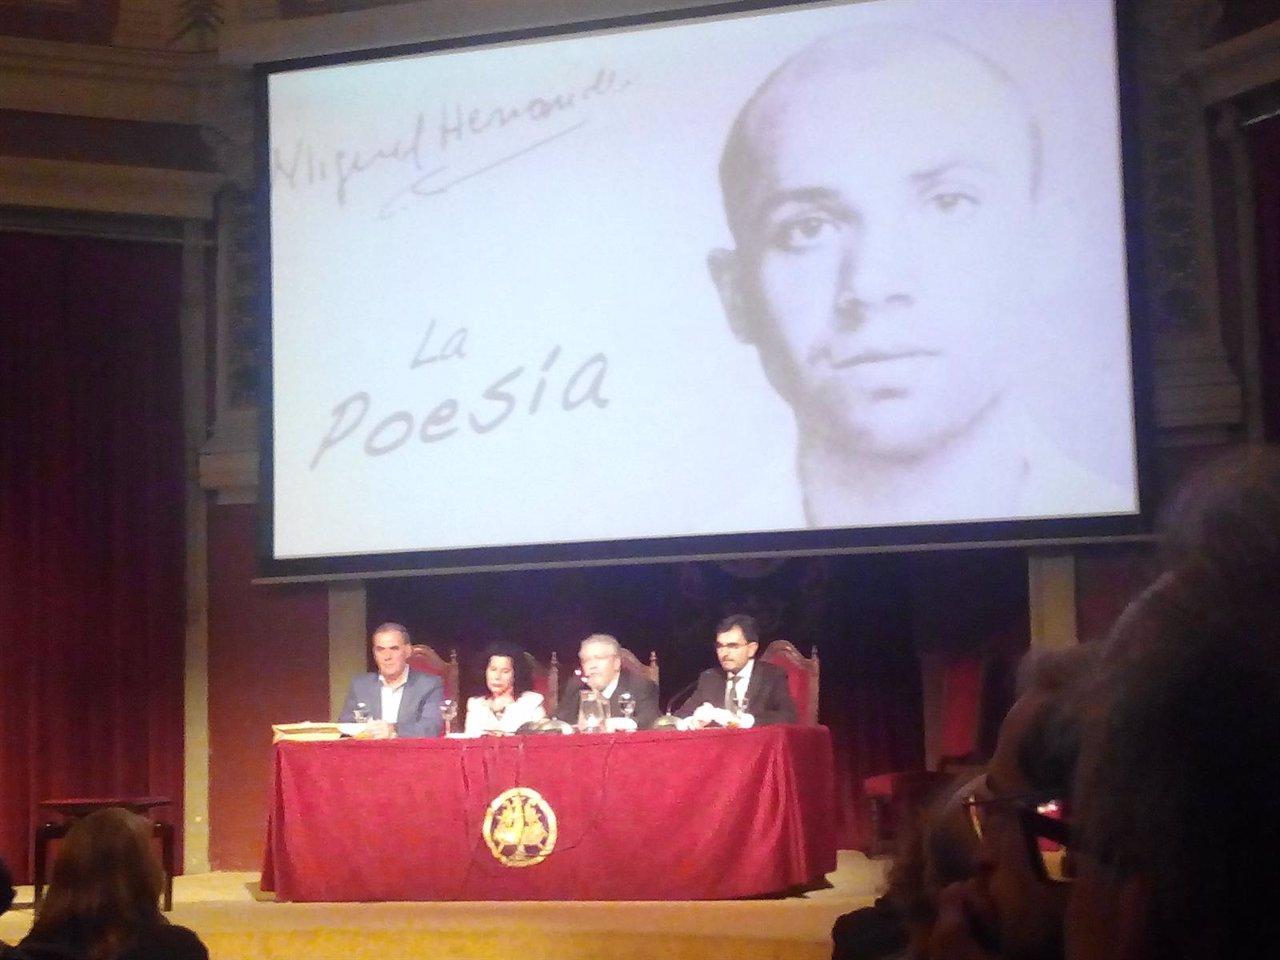 Presentación reedición de las memoricas de Josefina Manresa